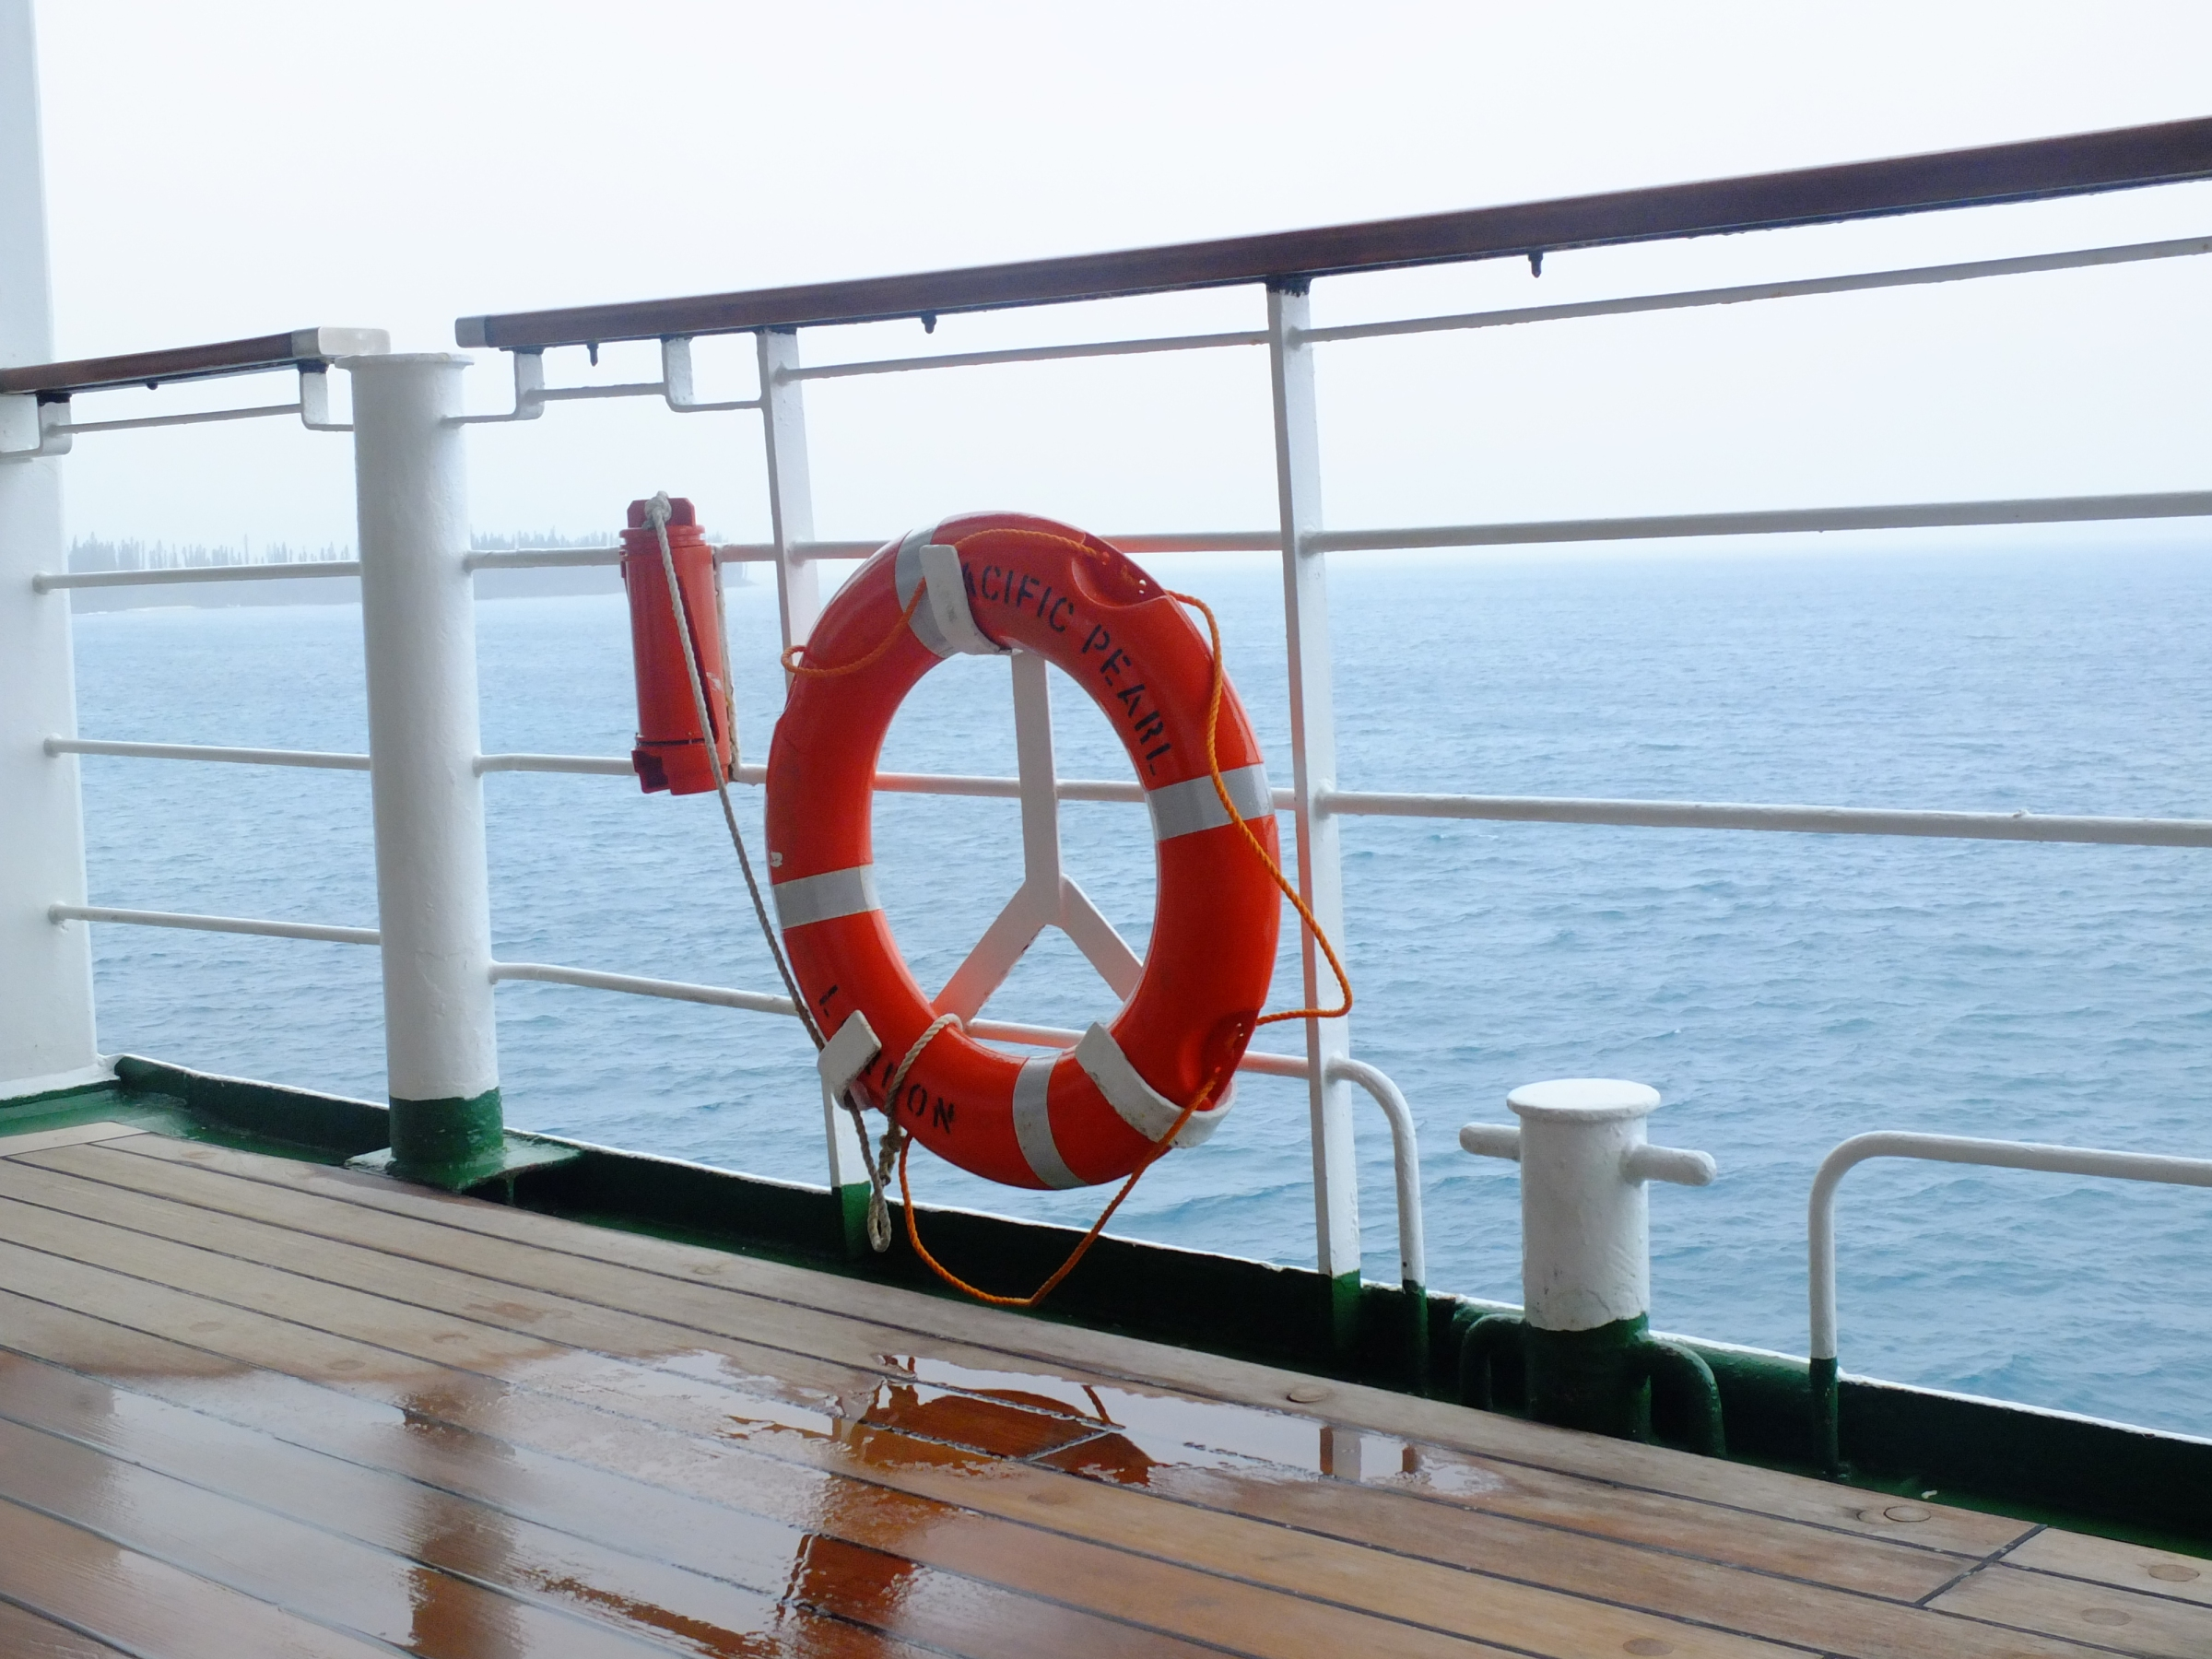 The deck of a P&O cruise ship